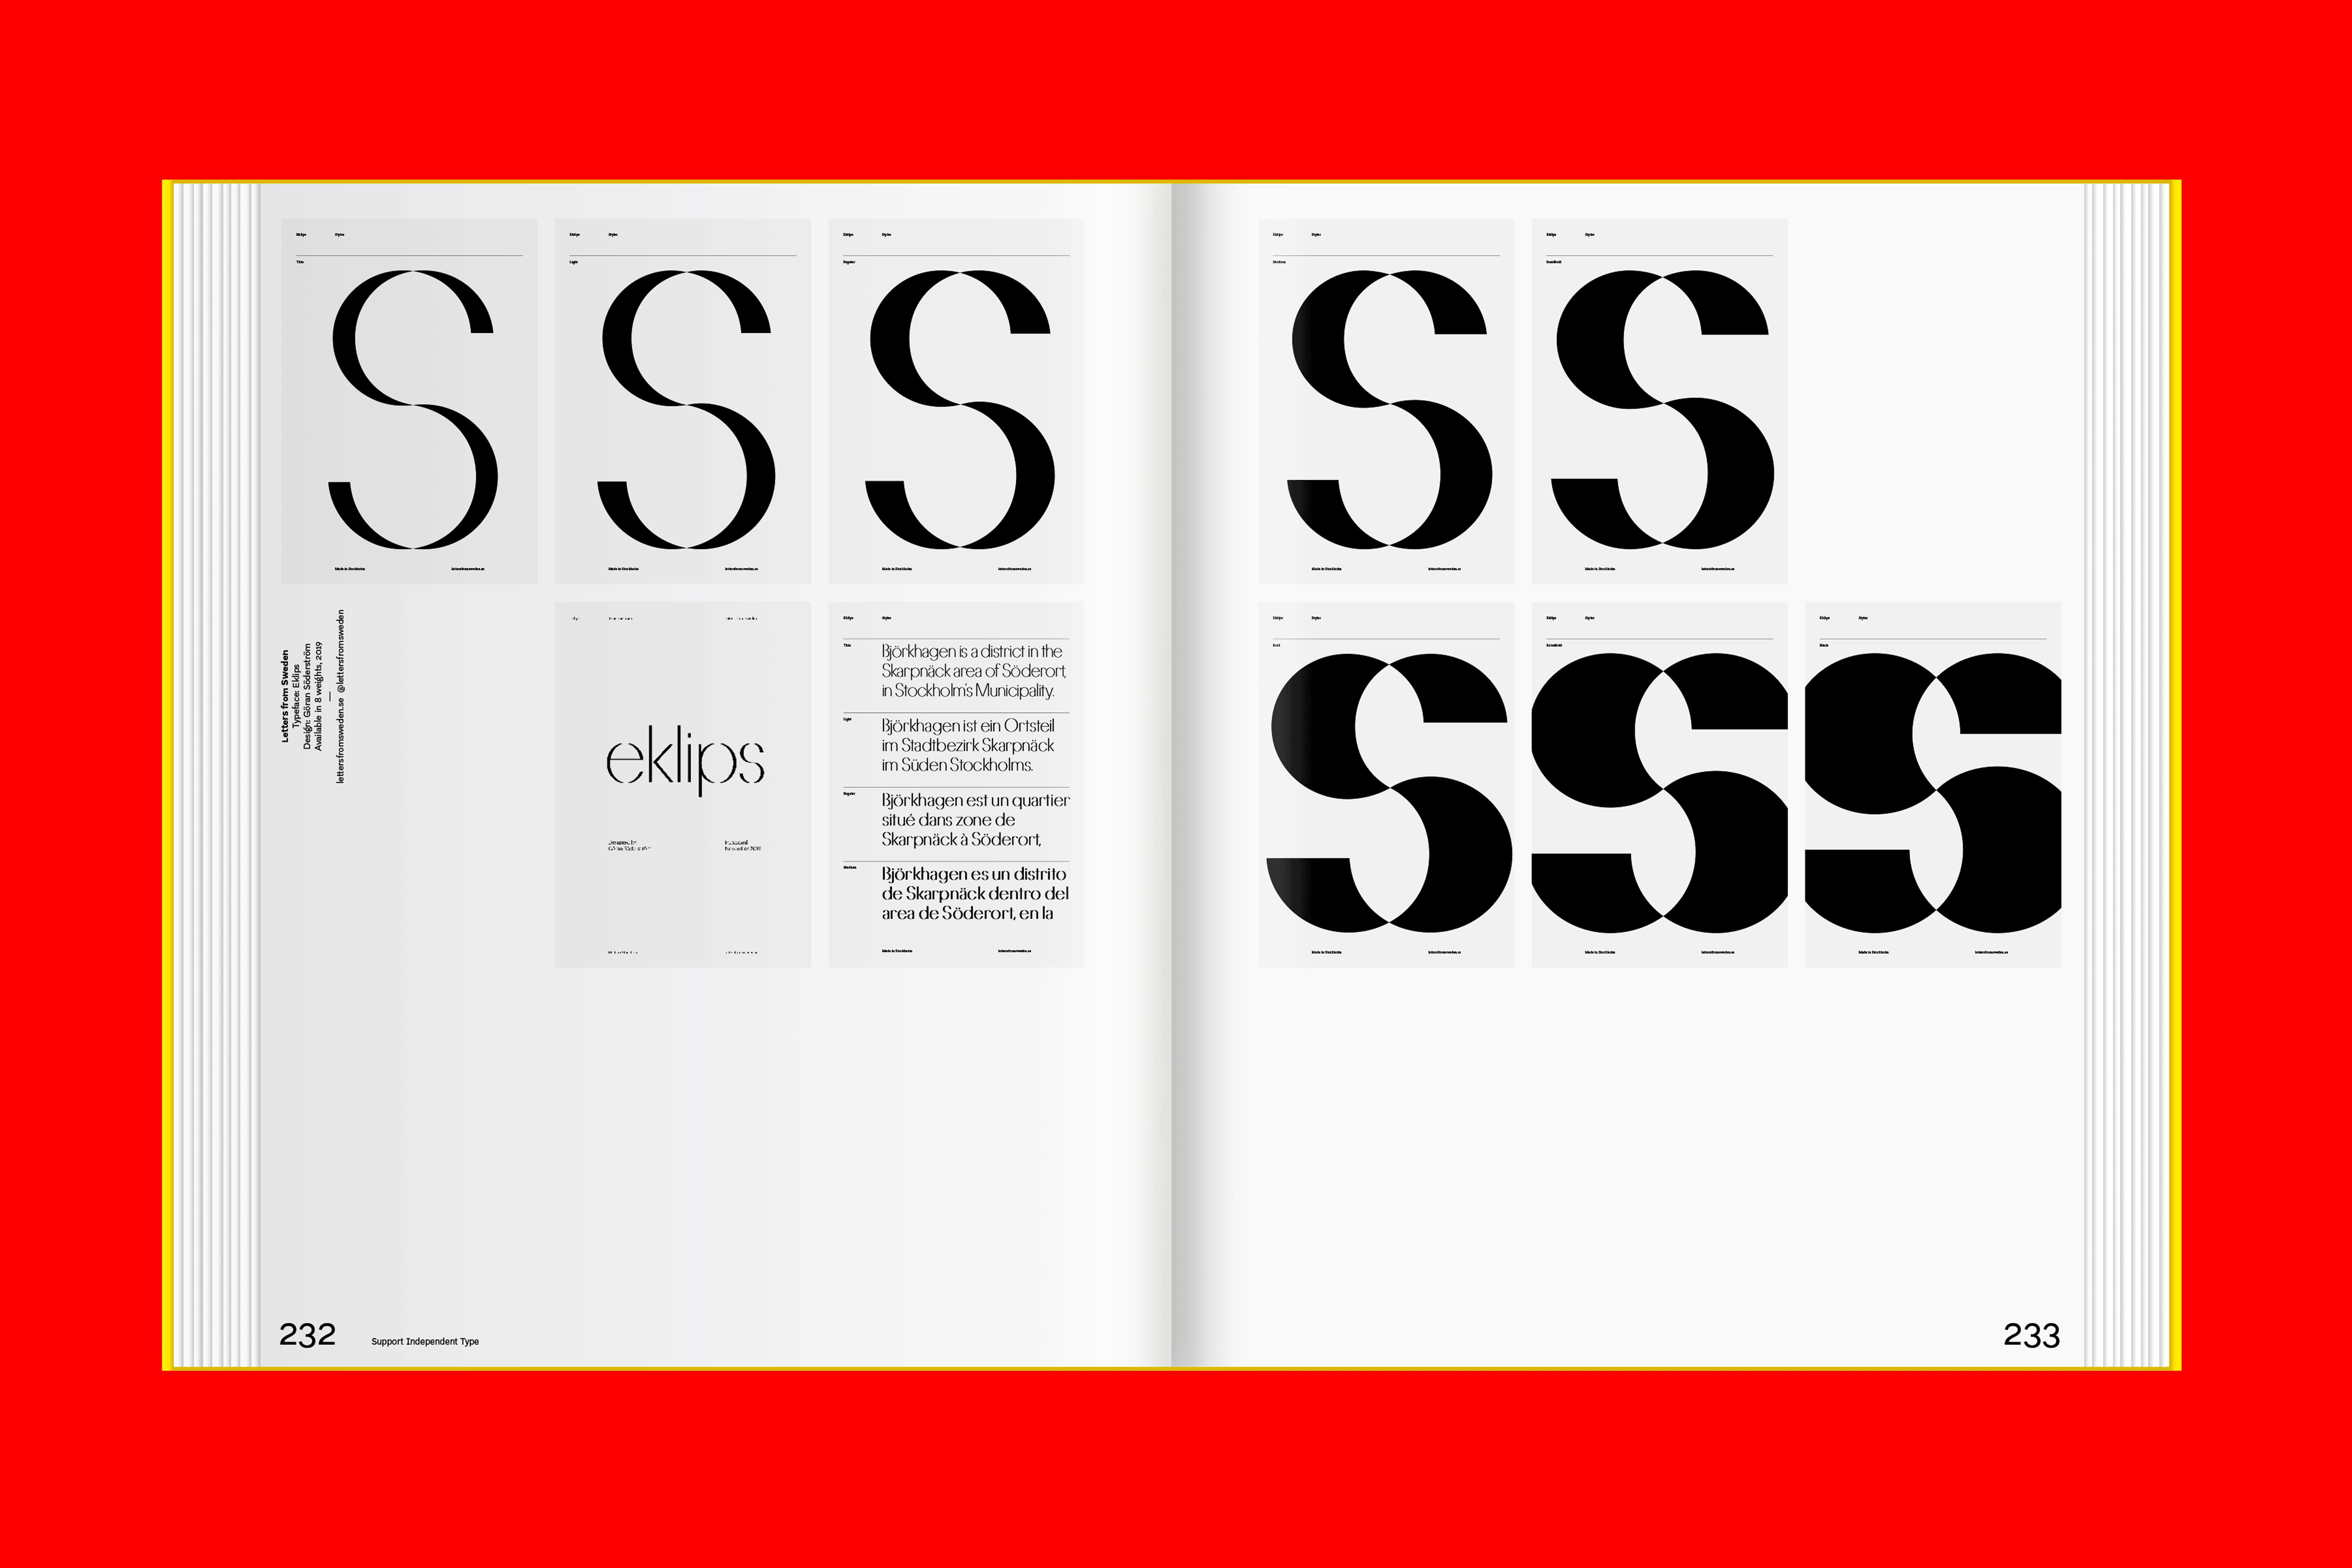 Slanted-Publiaktionen-Slanted-Publishers-Support-Independent-Type_30